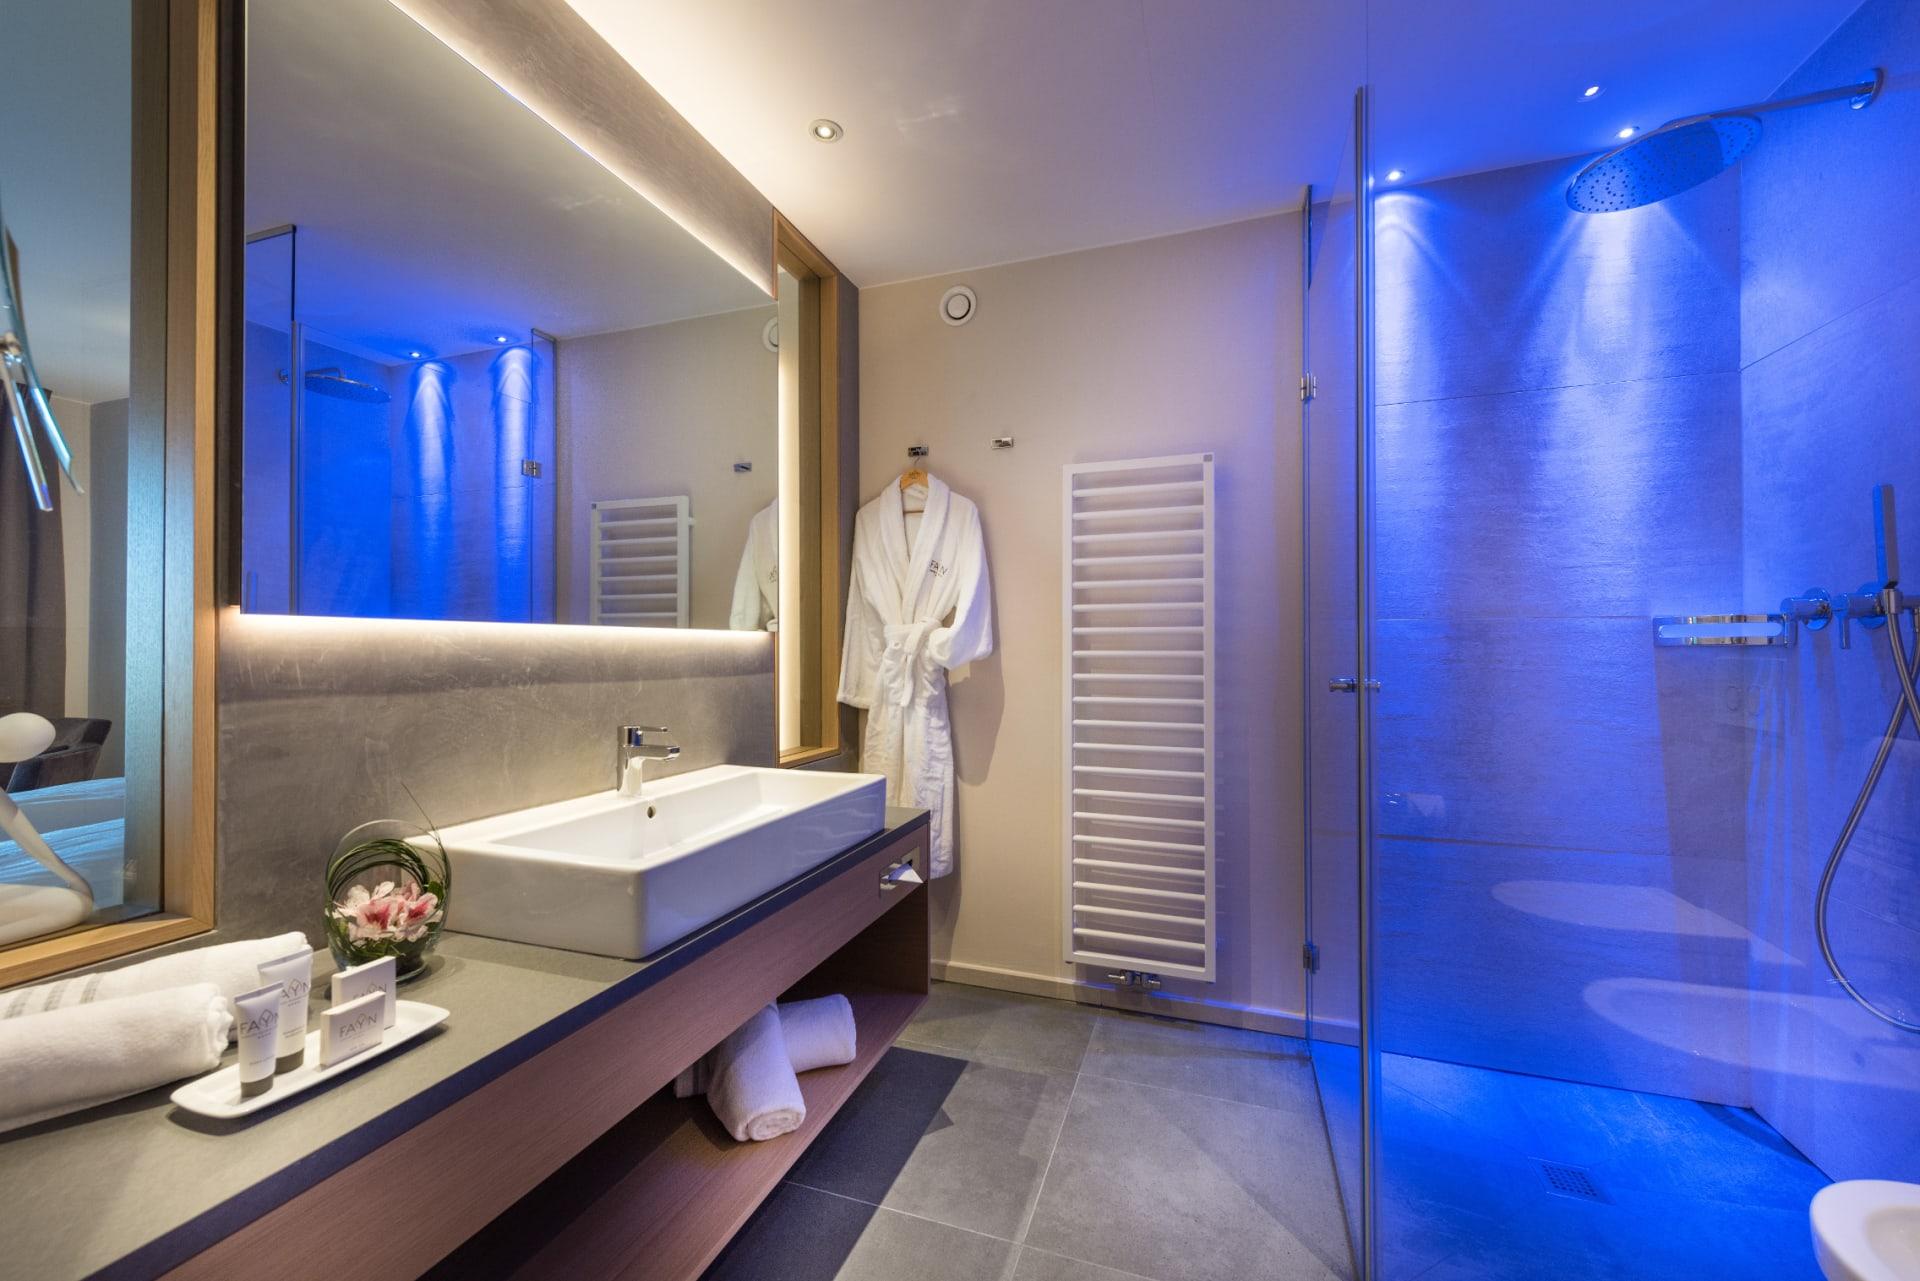 Package Details - FAYN HOTEL · 4 star Hotel in Lagundo - South Tyrol